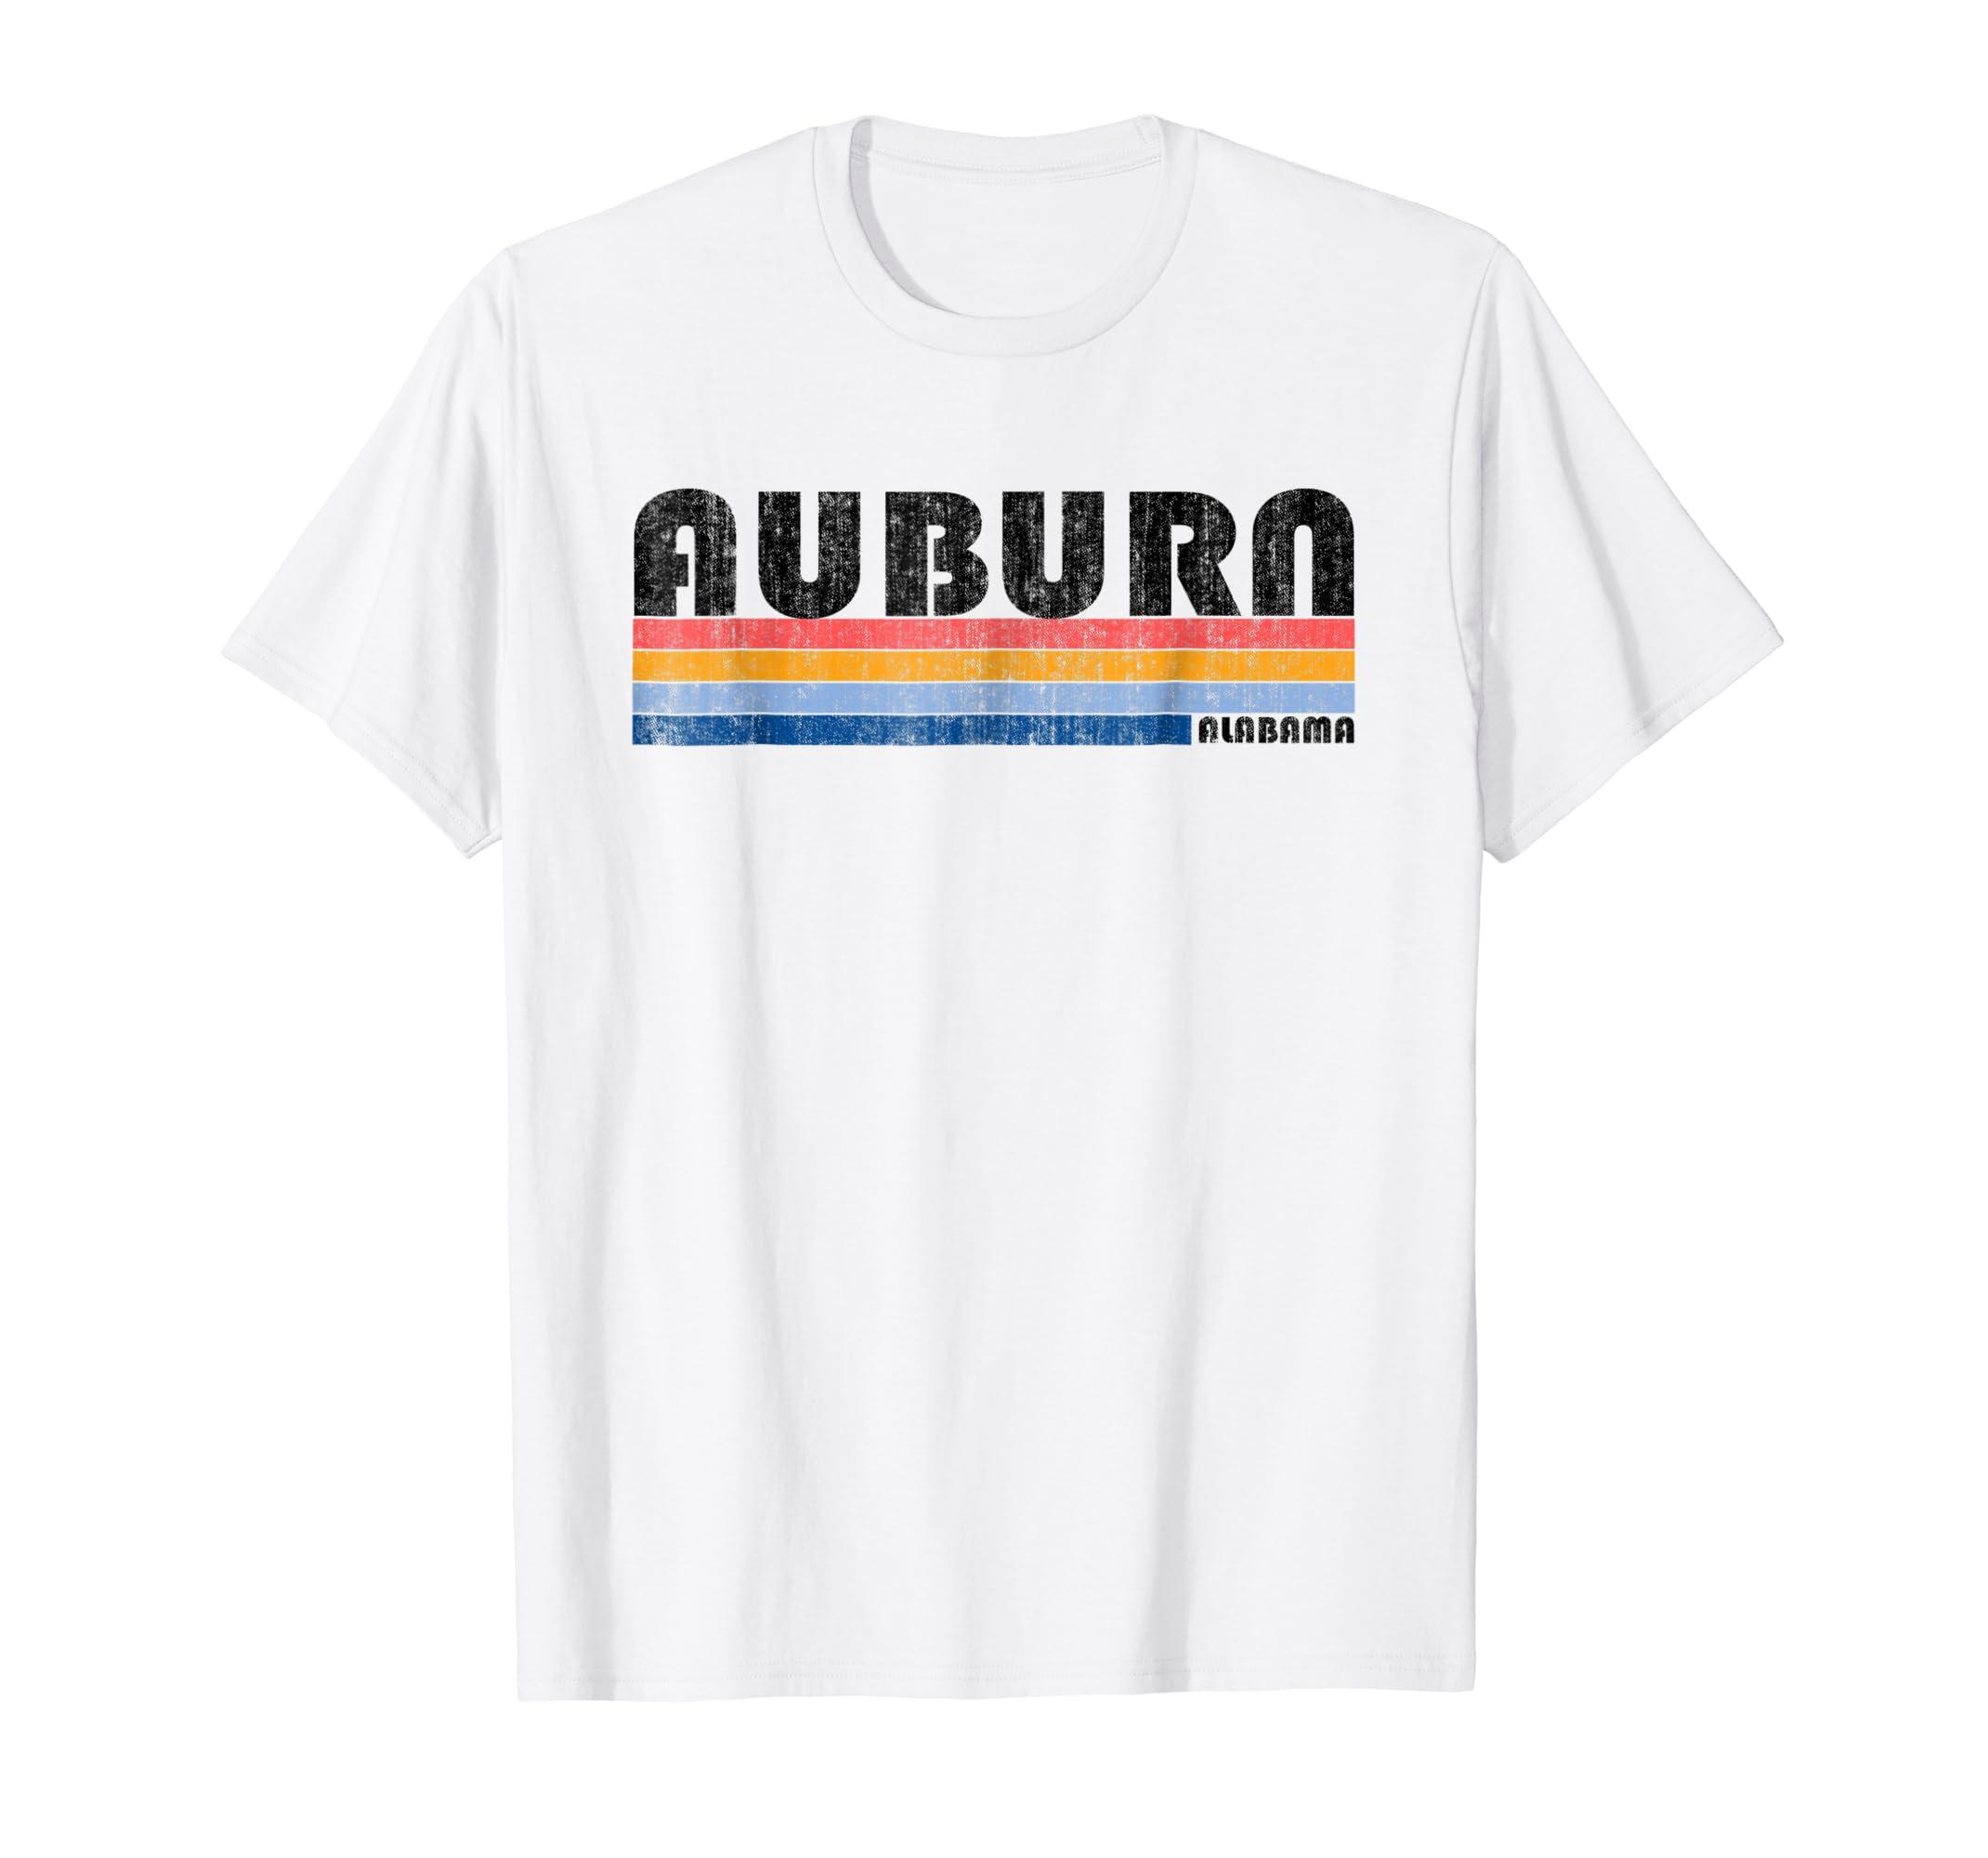 98e8649f7 Vintage Auburn University Shirts